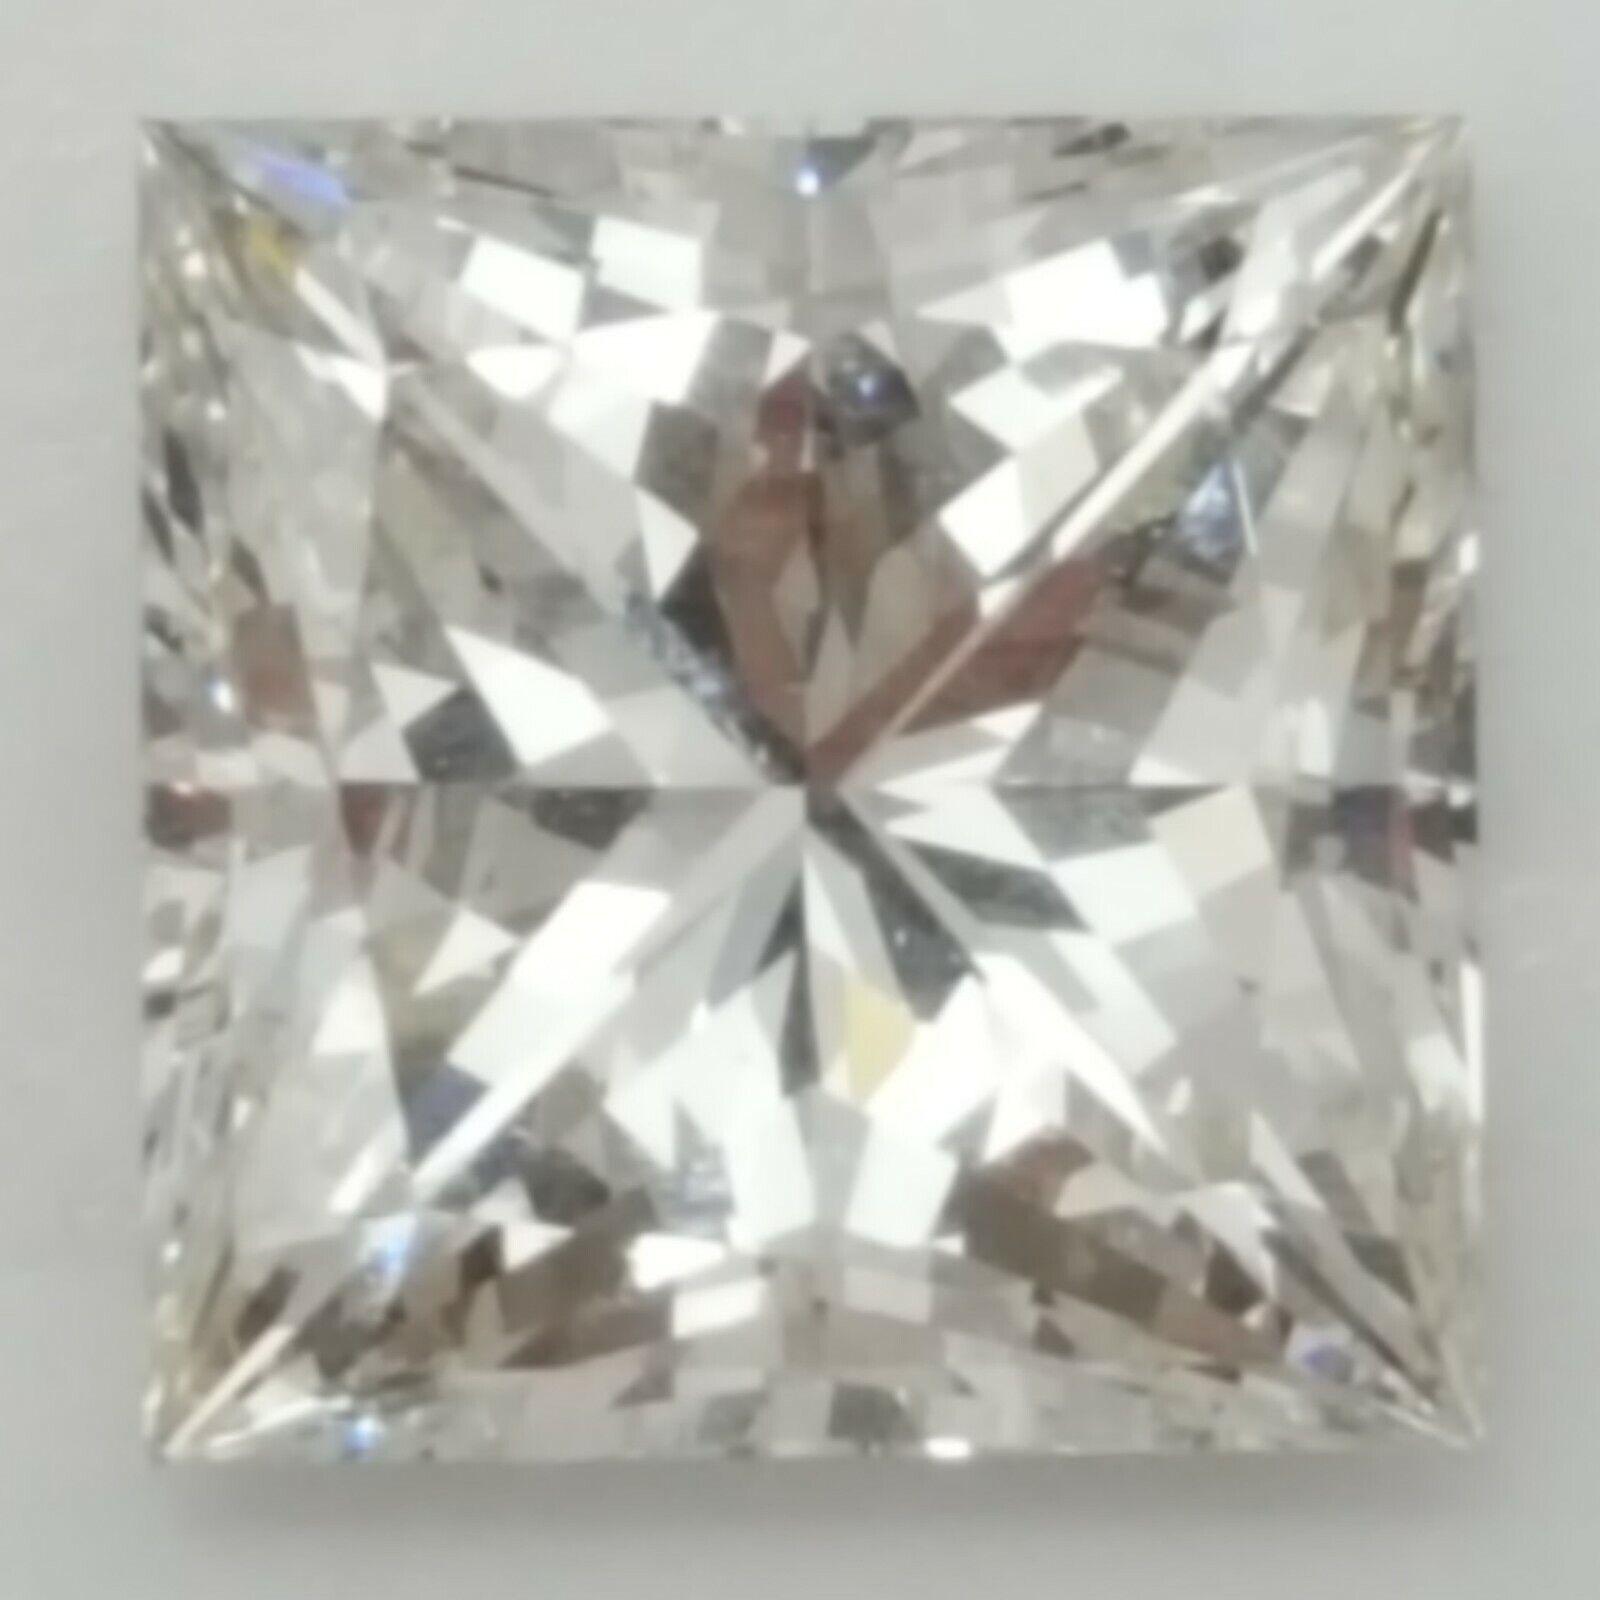 3.61 Carat Princess Cut Loose Square Diamond GIA Certified I/VS1 Natural Diamond